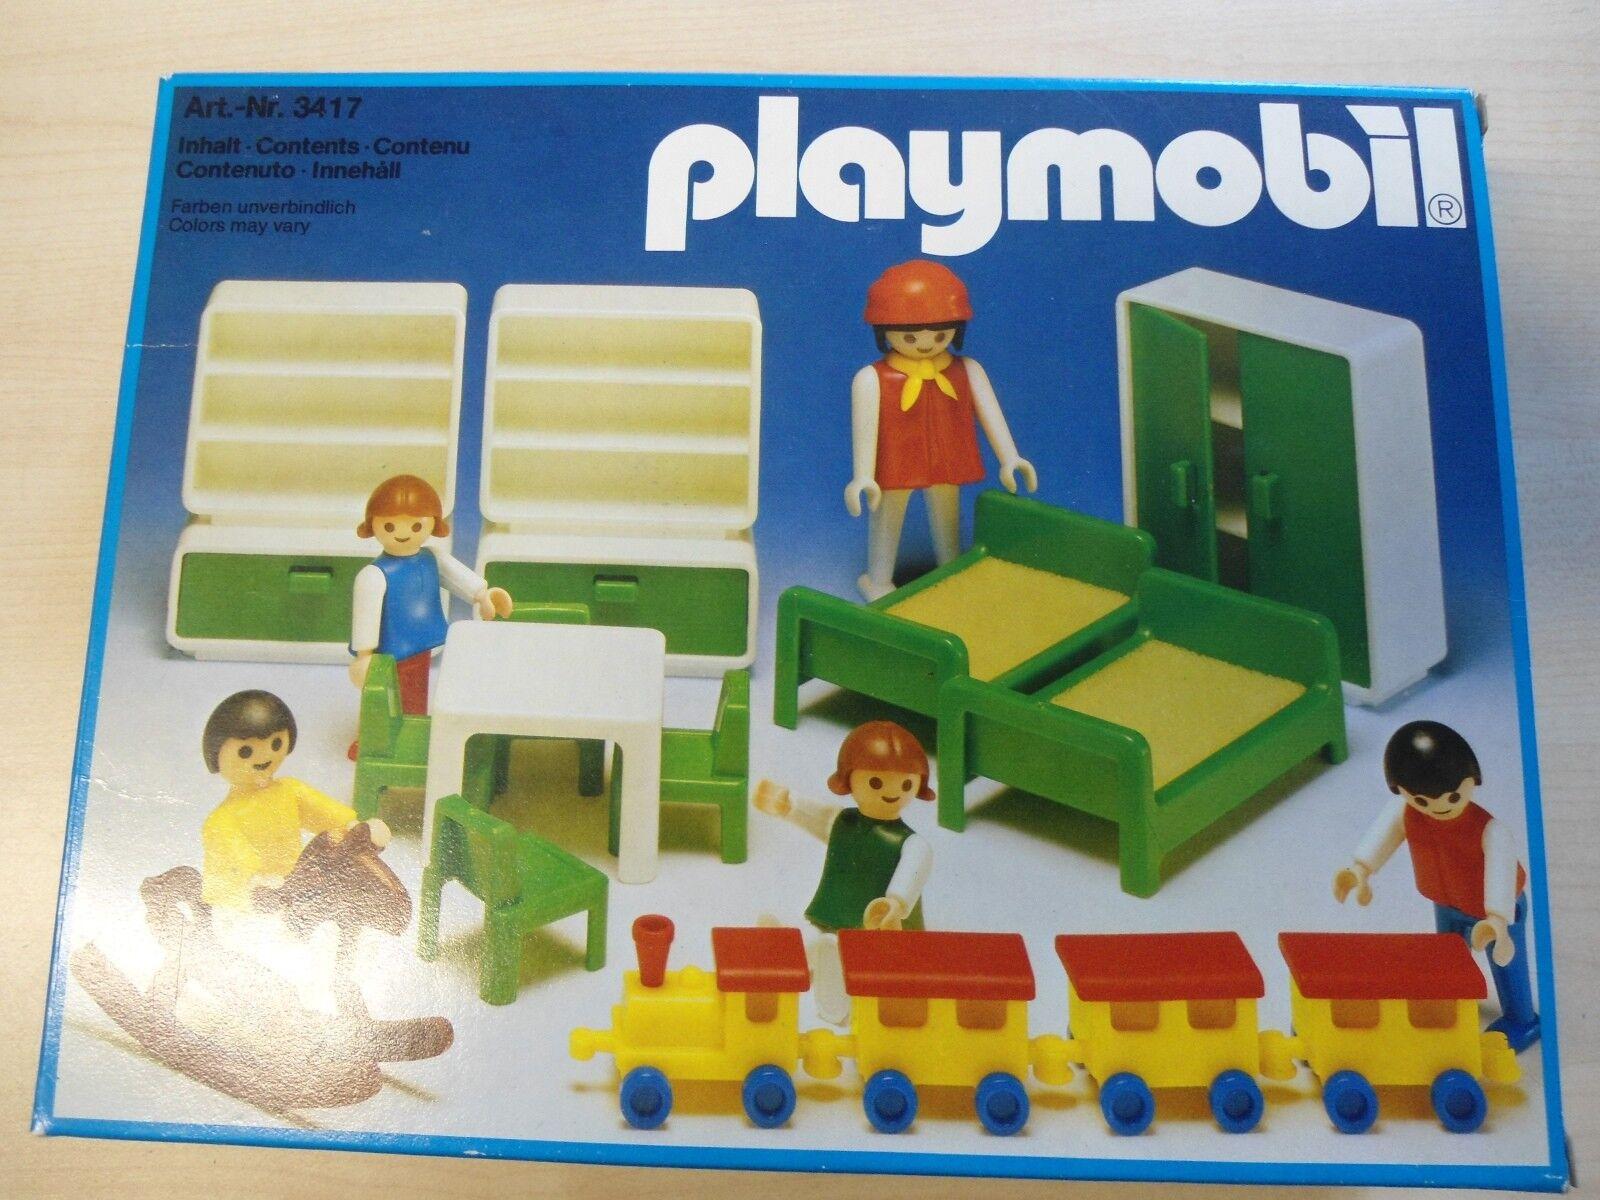 Playmobil  Klicky 3417  Kinderzimmer  NEU